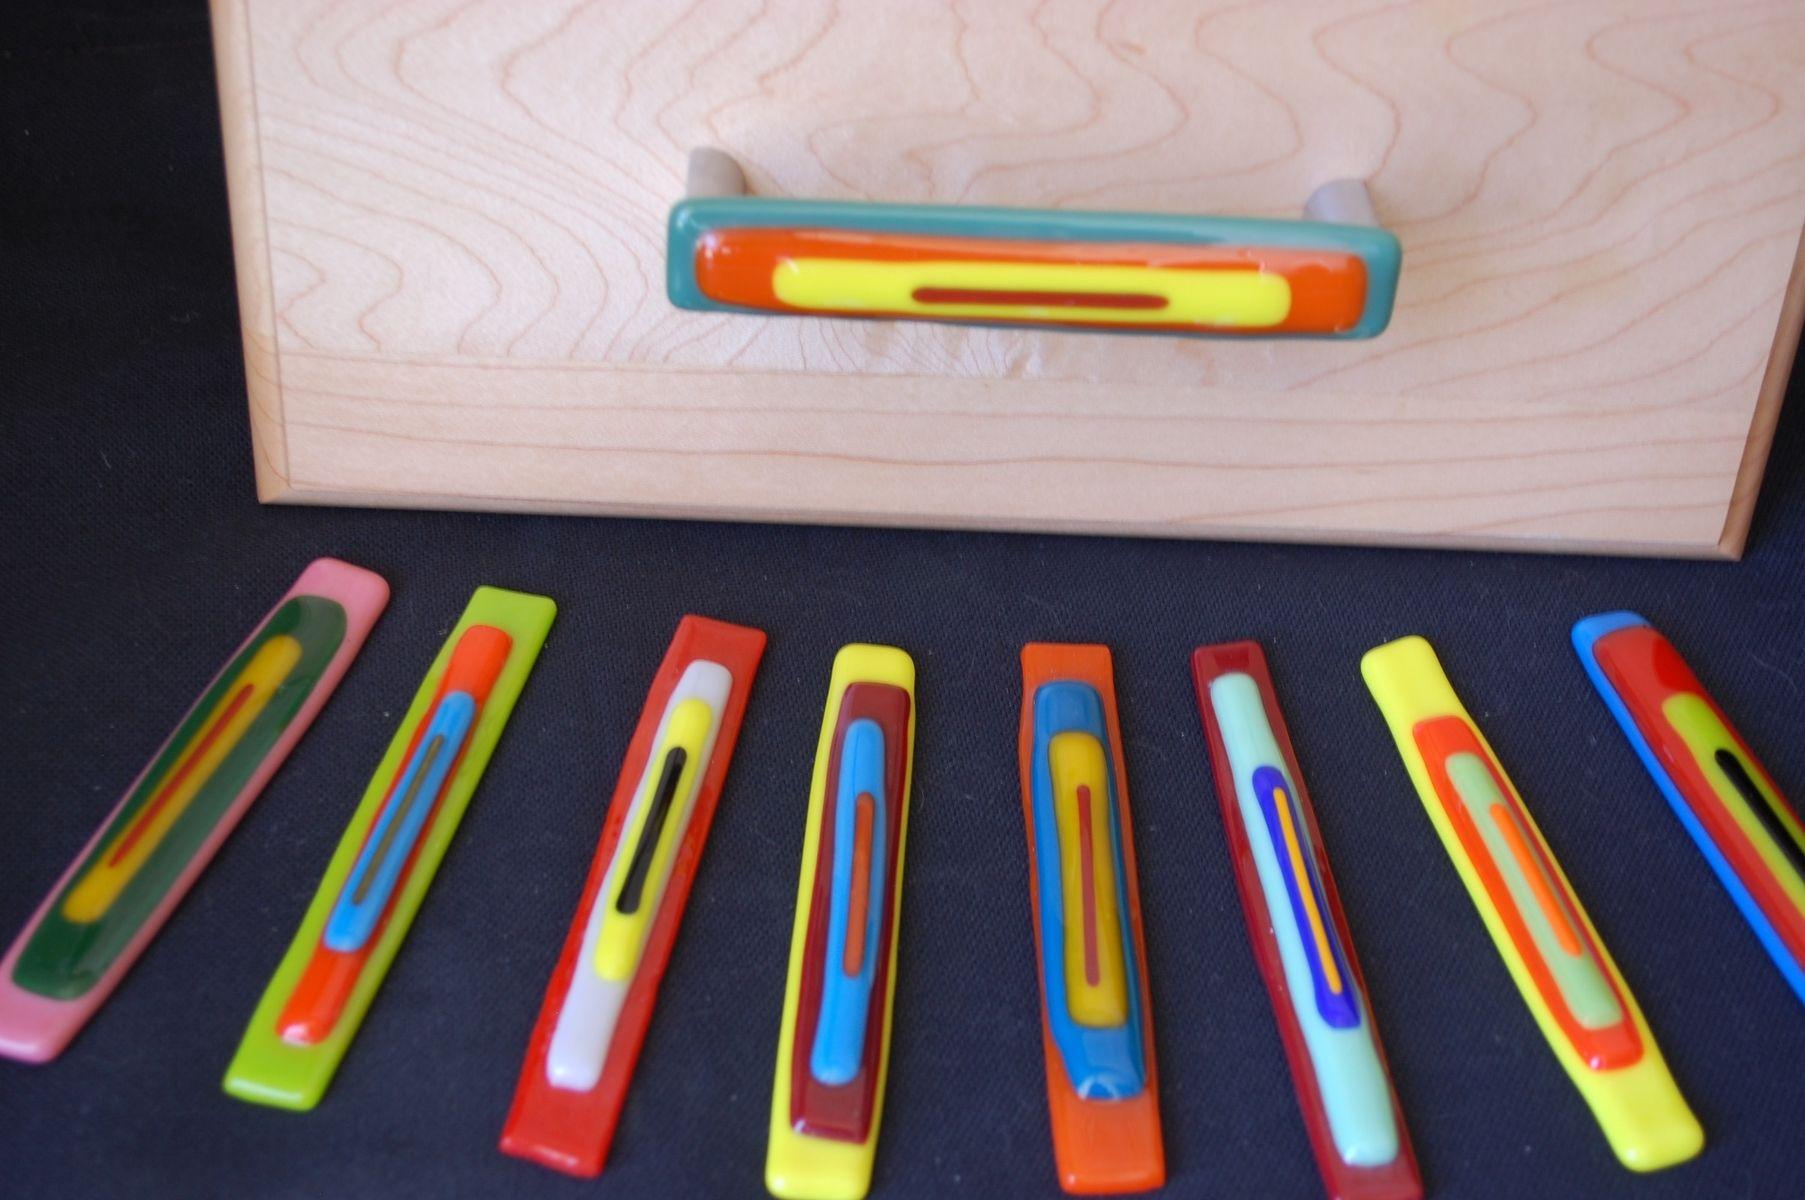 Custom Fused Glass Drawer Pulls by Lizabkap Design | CustomMade.com